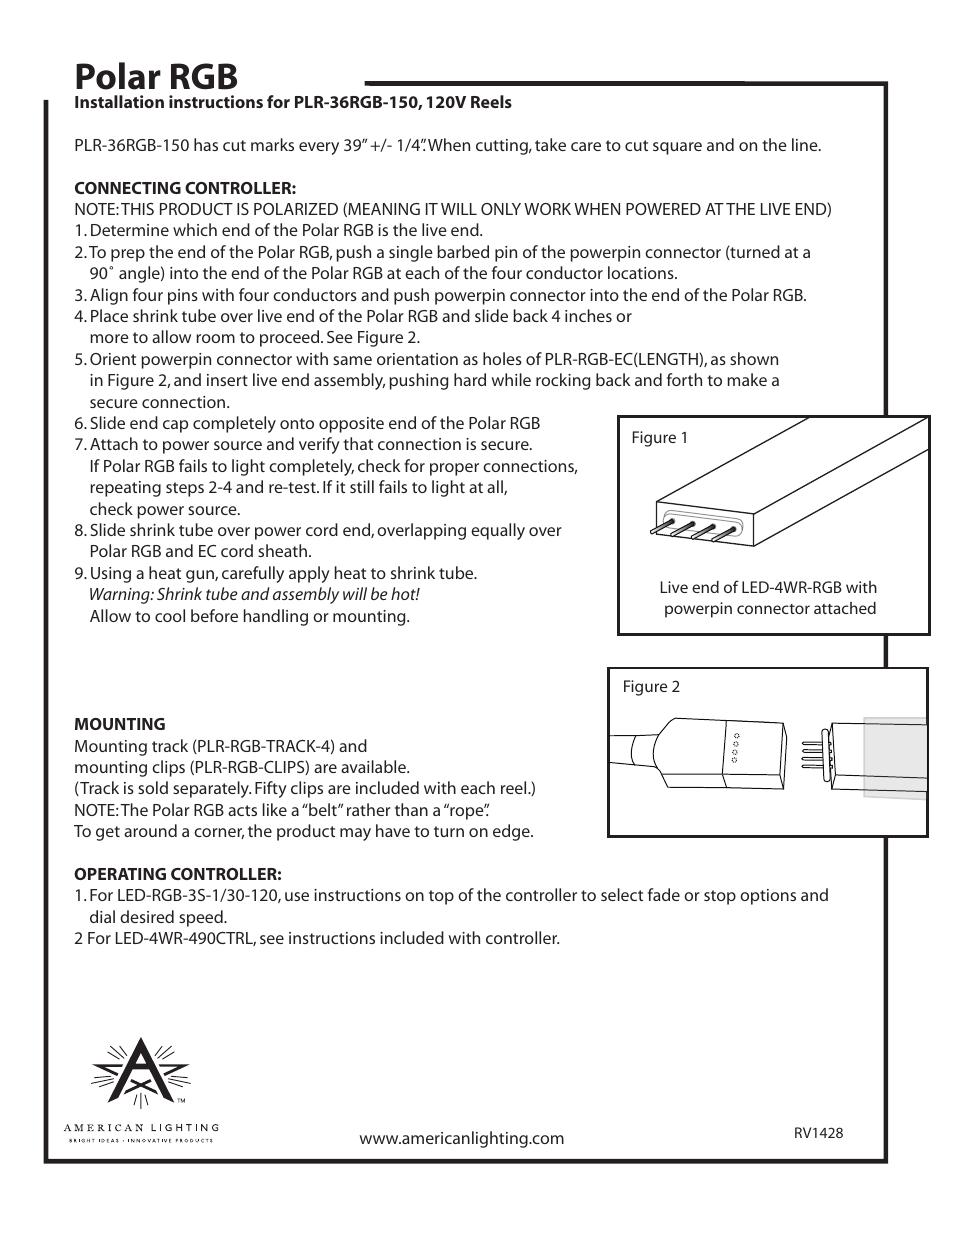 Polar rgb | American Lighting PLR-36RGB-150 User Manual | Page 2 /  sc 1 st  manualsdir.com & Polar rgb | American Lighting PLR-36RGB-150 User Manual | Page 2 / 2 ...